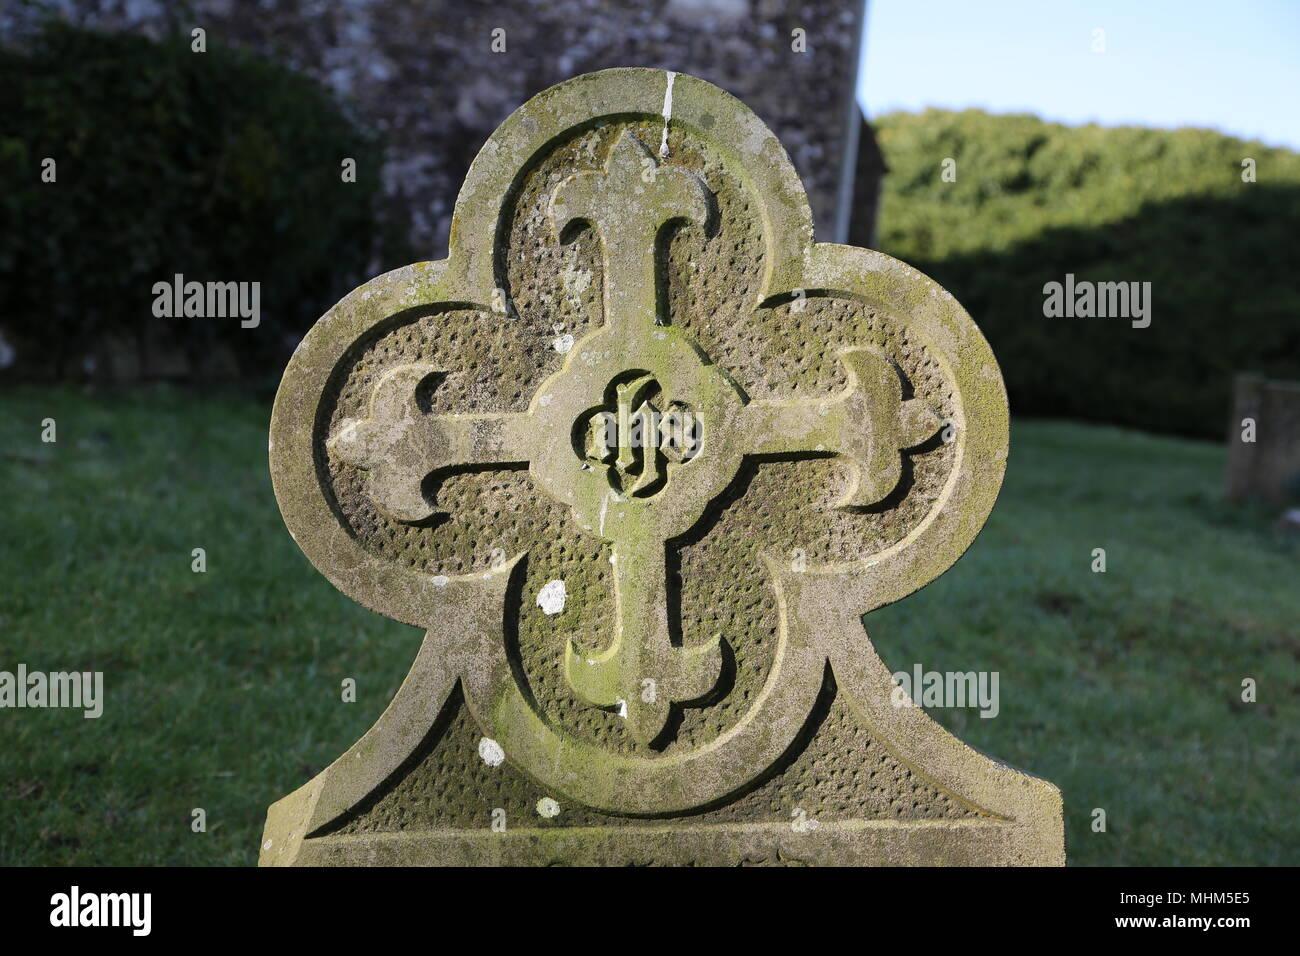 Grave stone symbol - Stock Image